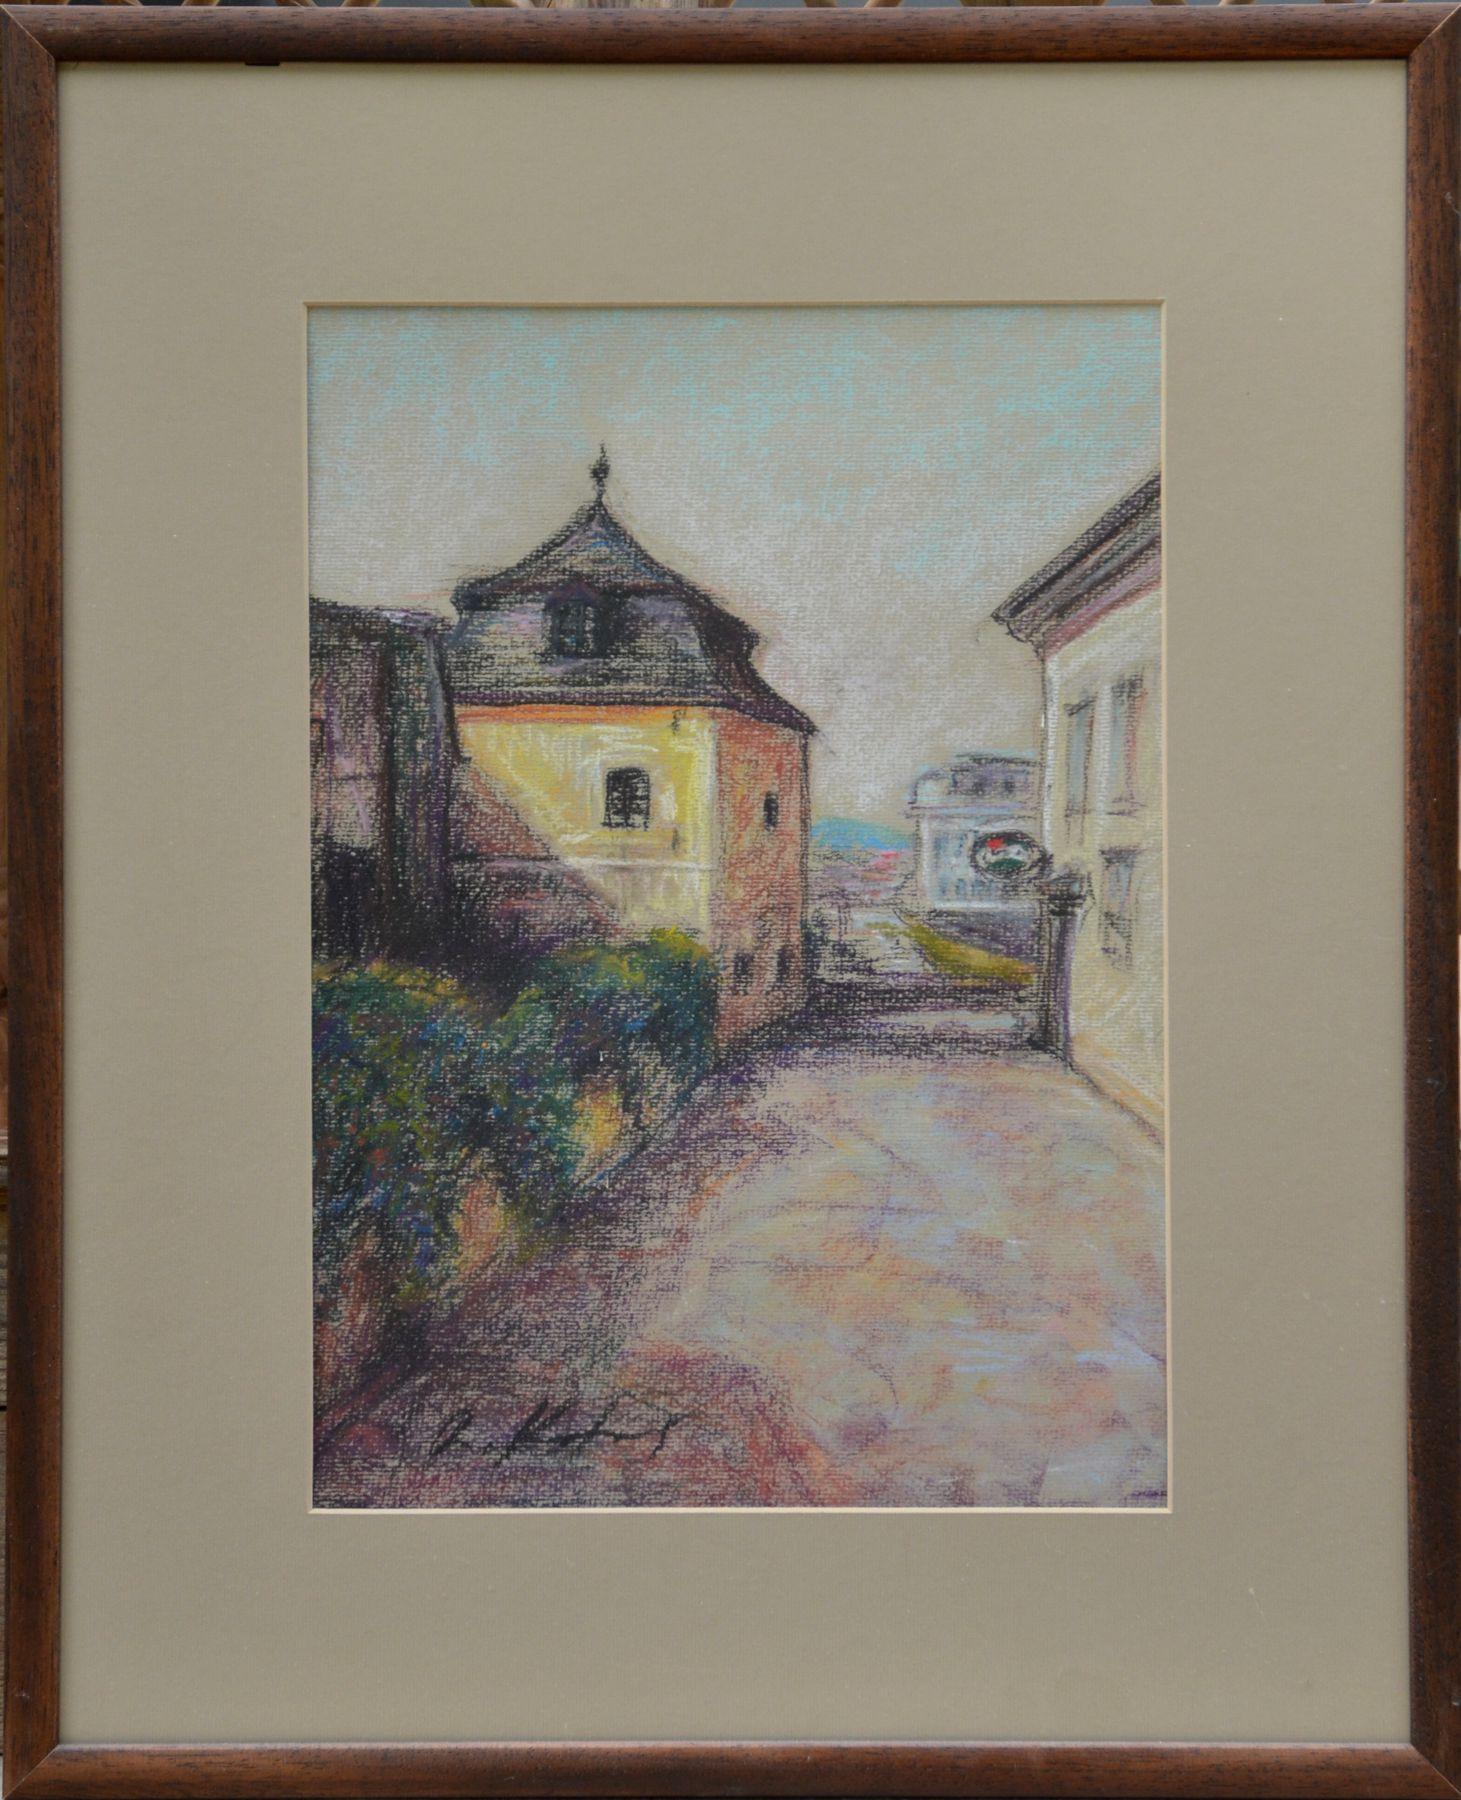 Rastislav Kotal – Ku kumštu, suchý pastel na papieri, 39 x 27,5 cm, 58 x 46,5 cm s rámom, 2016